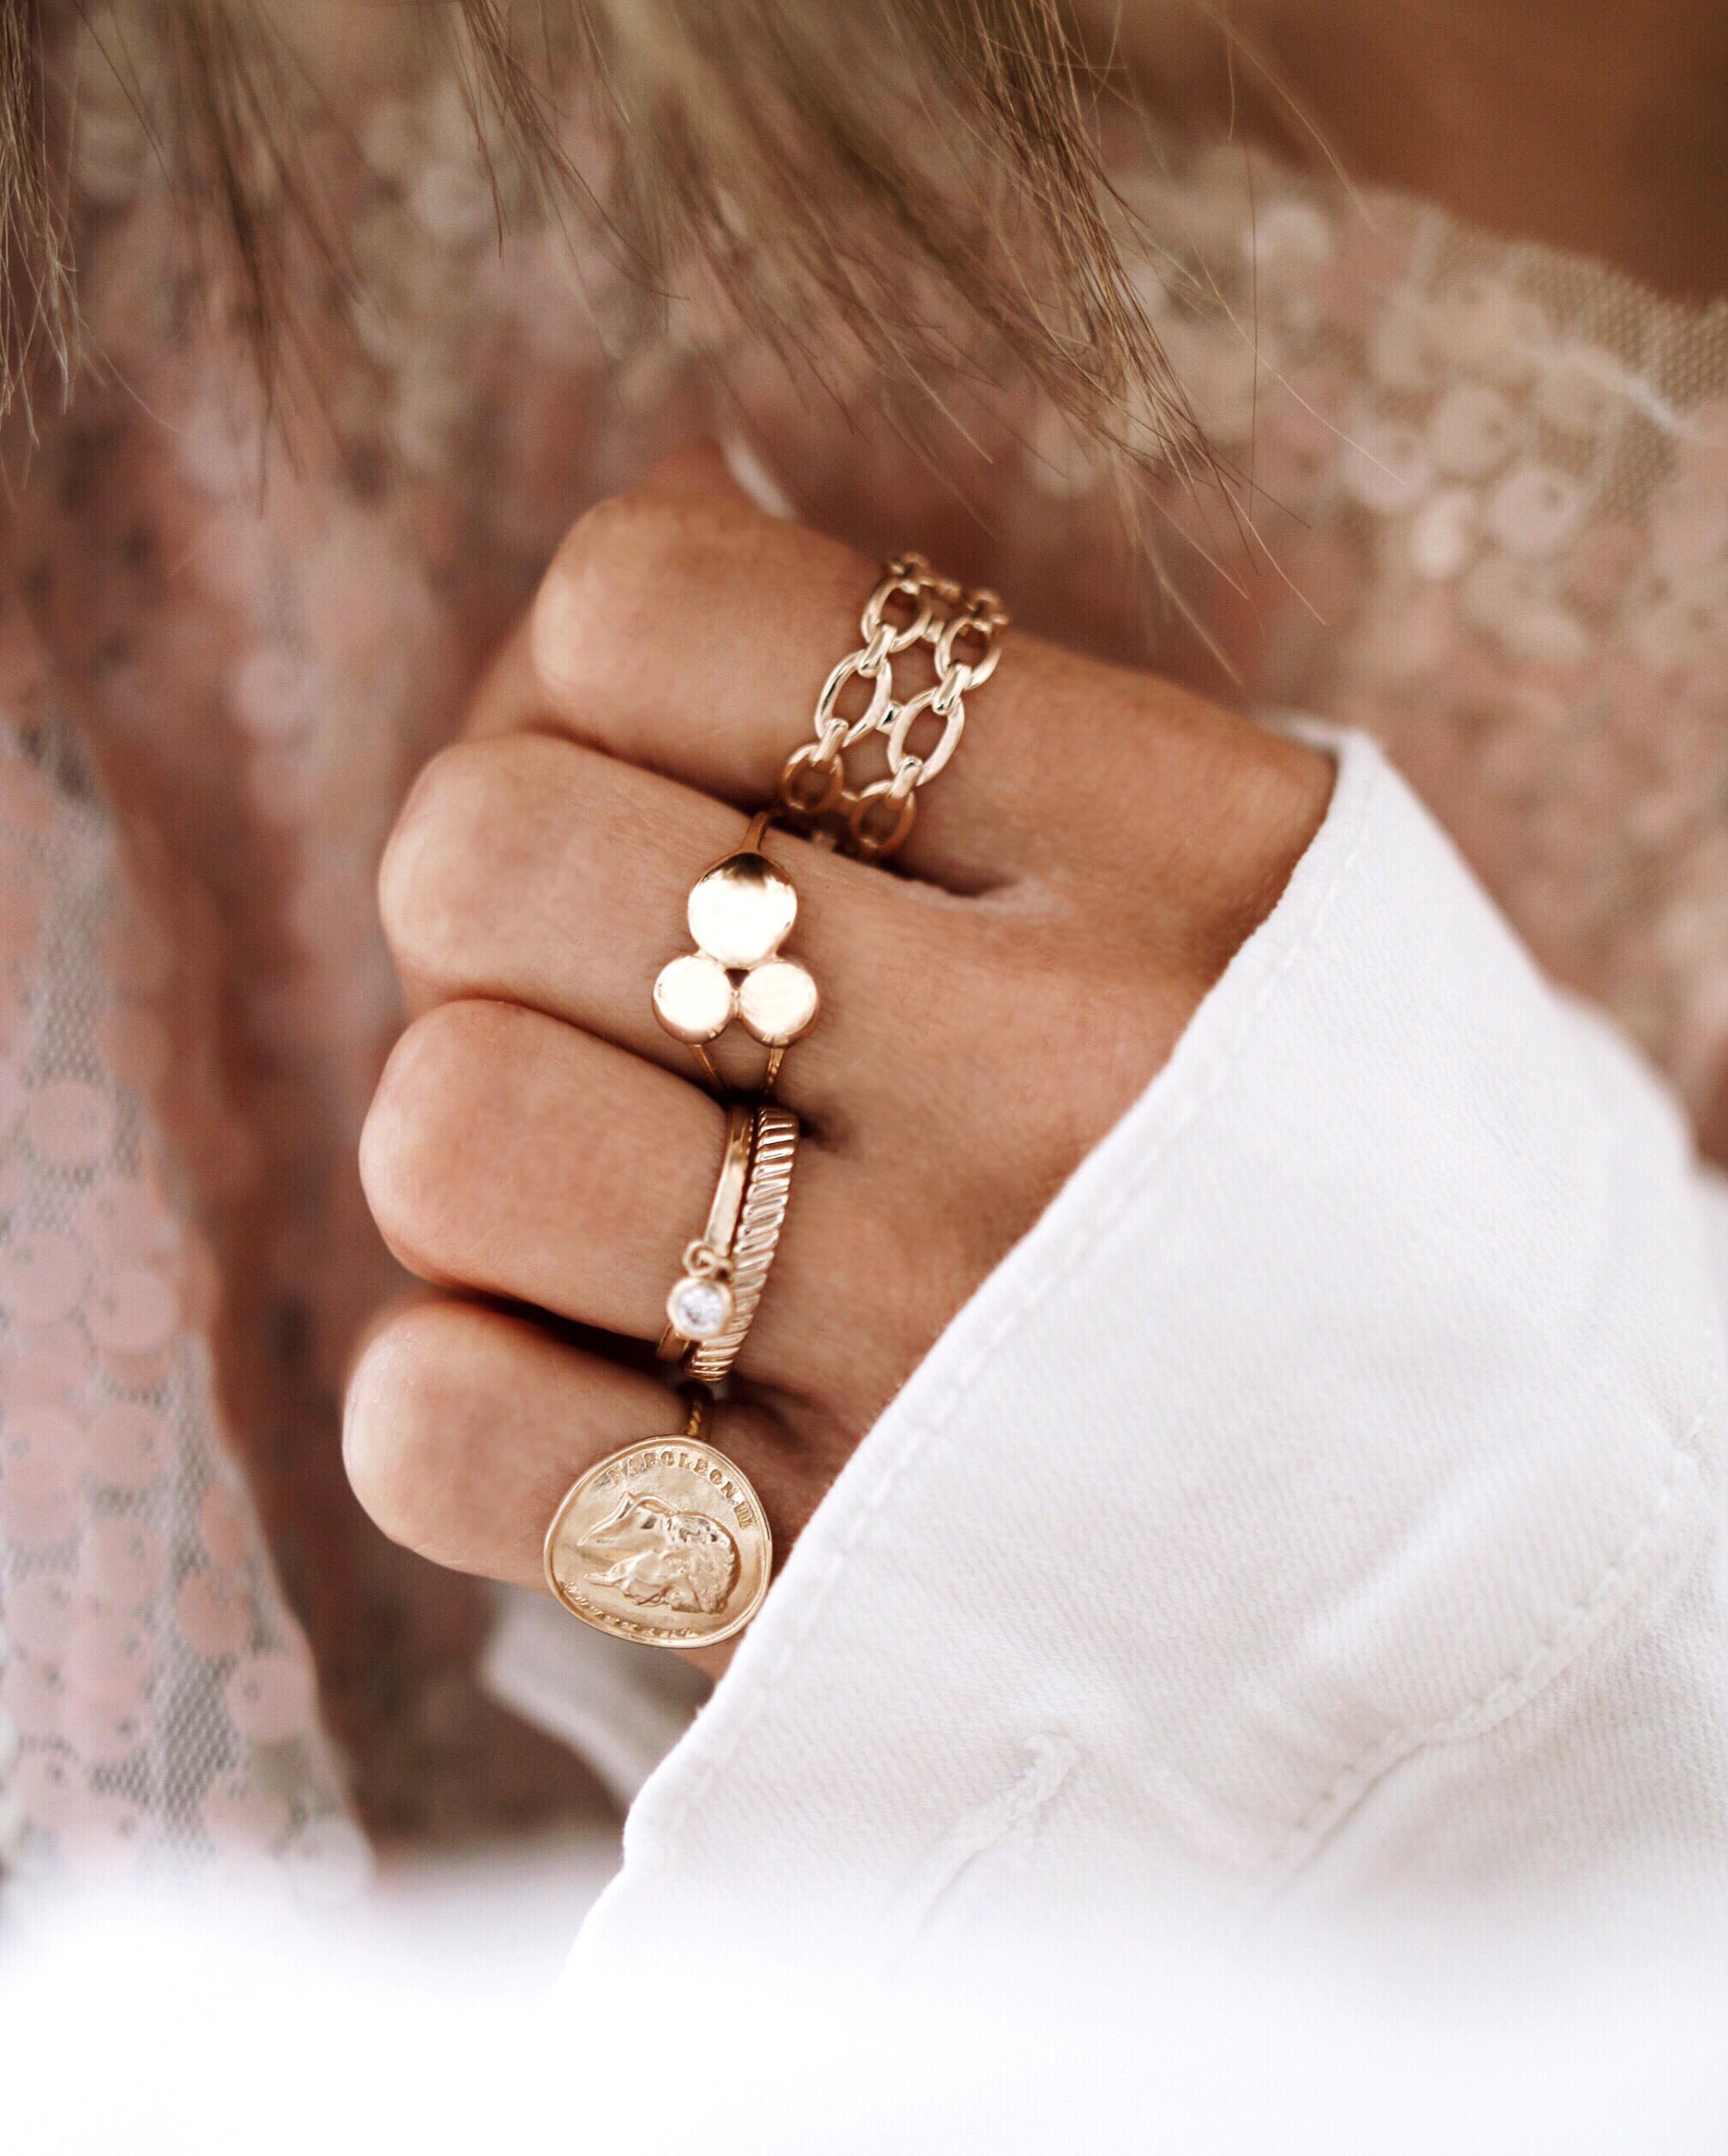 accumulation de bagues or, blog bijoux, bijoux addict, ings lover, rings set, gold rings, jexelry designer, jewelry inspiration, WAEKURA